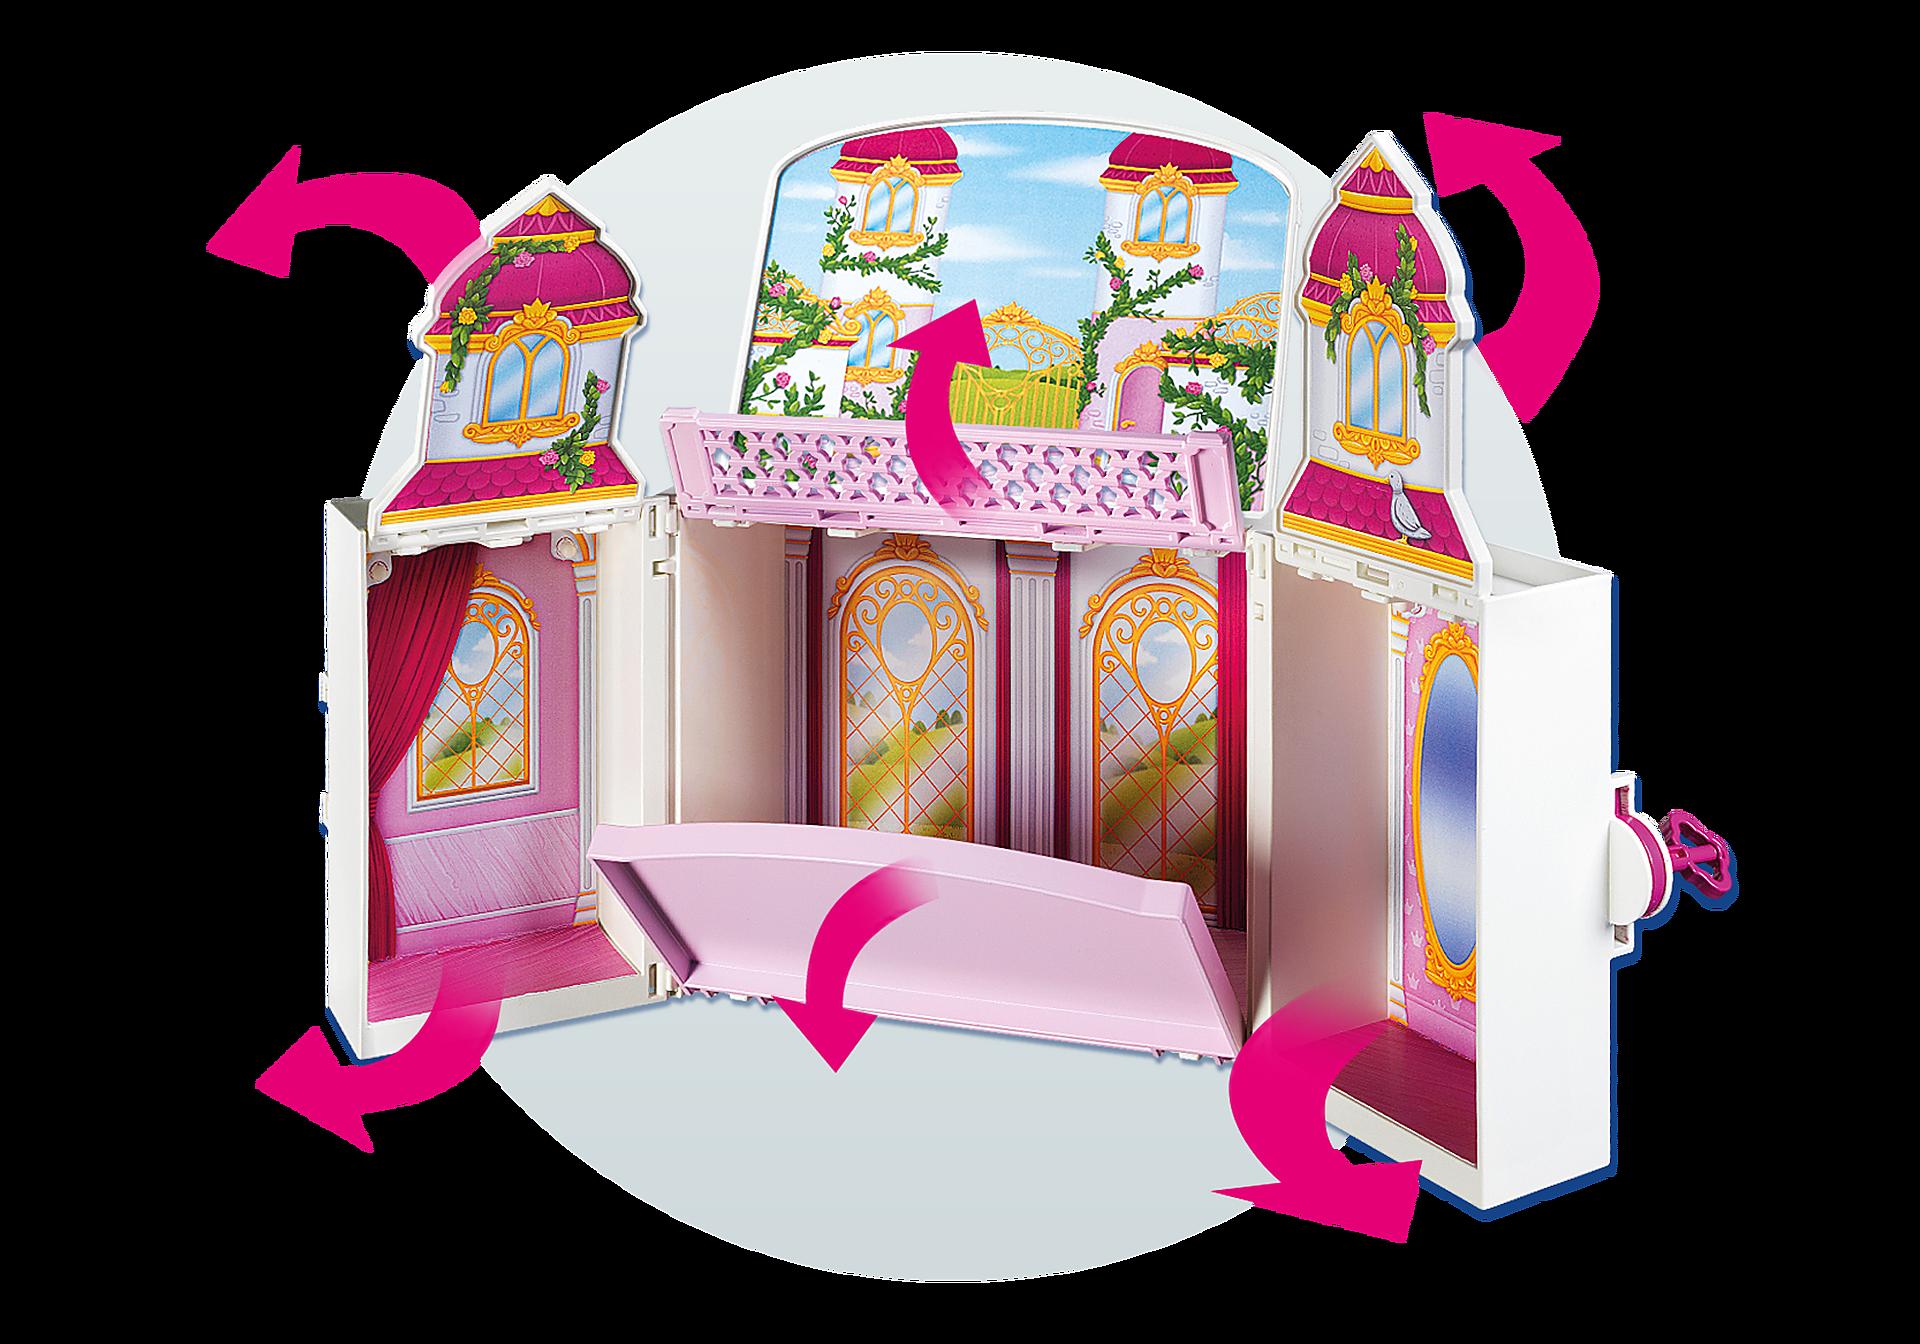 http://media.playmobil.com/i/playmobil/4898_product_extra2/My Secret Royal Palace Play Box